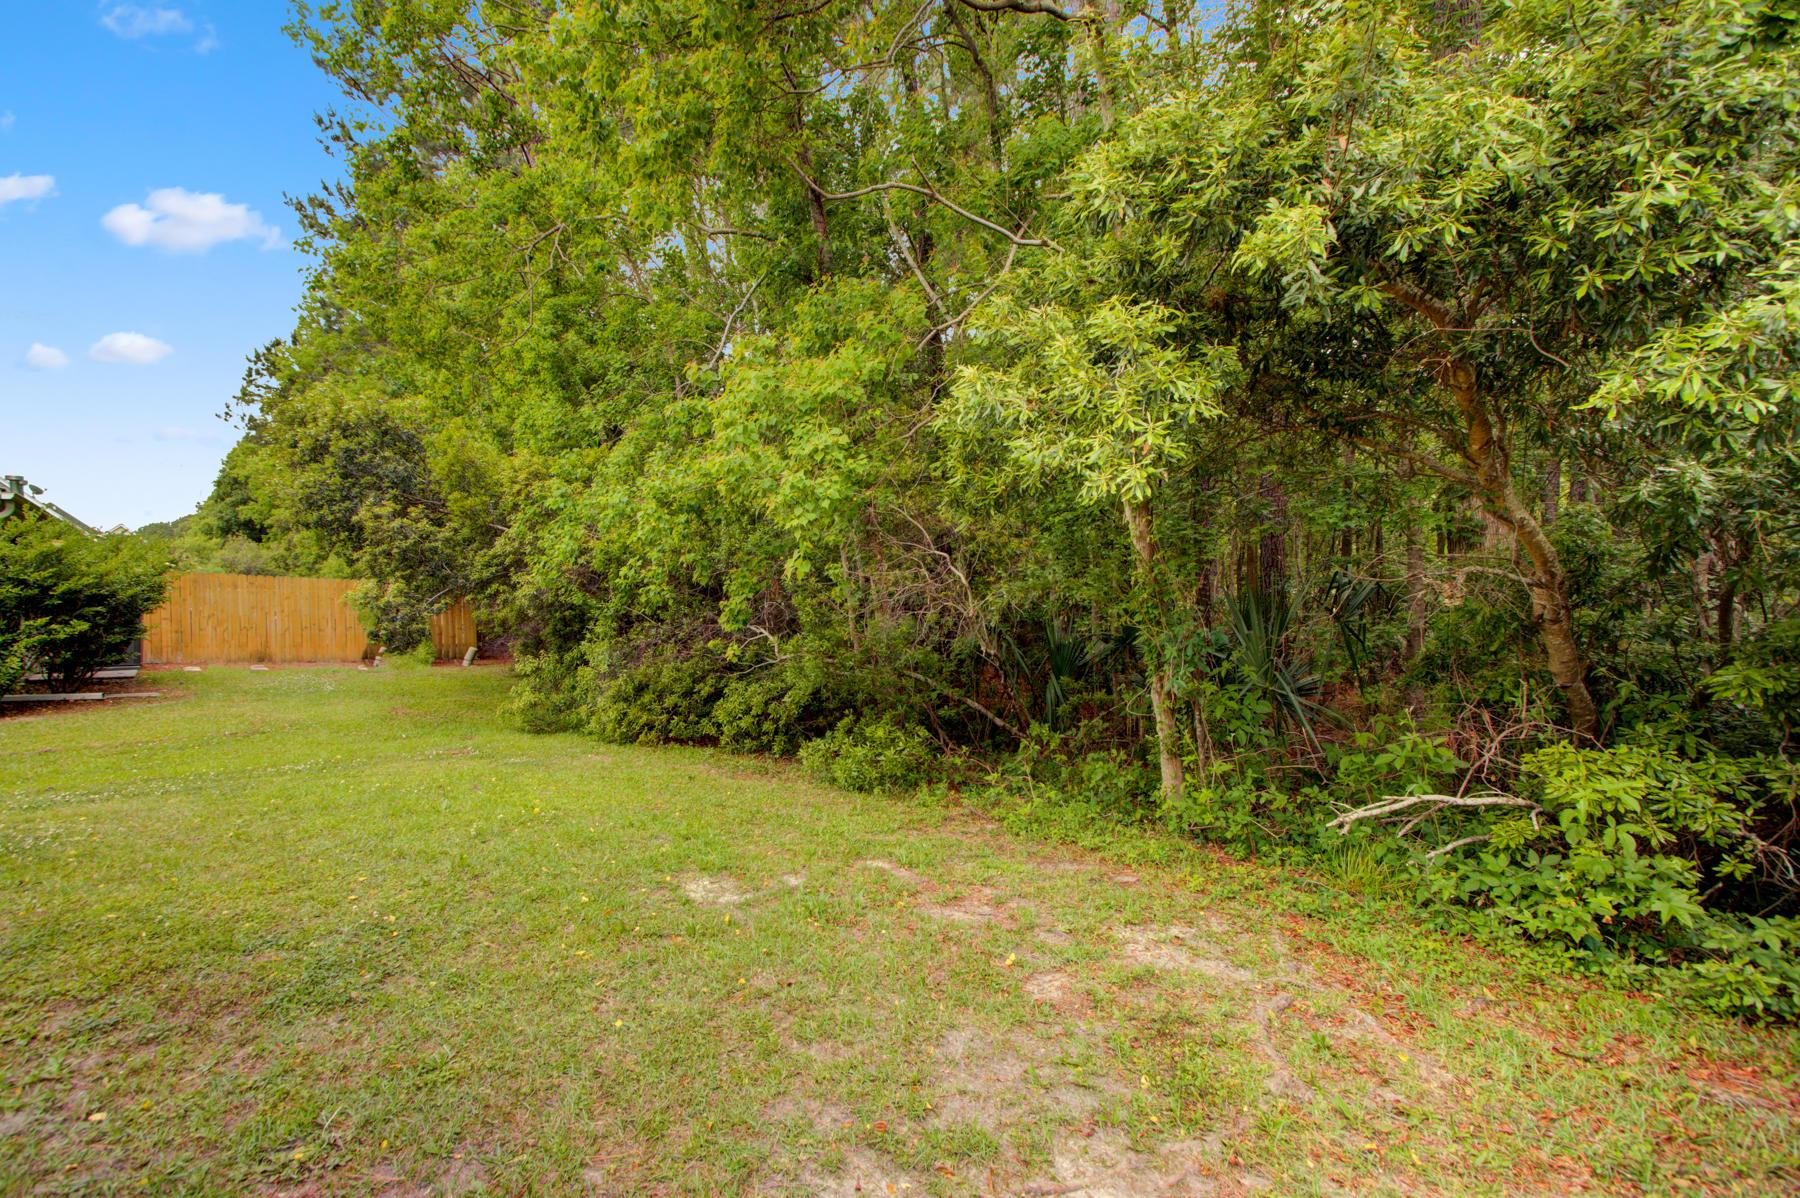 Dunes West Homes For Sale - 2232 Kings Gate, Mount Pleasant, SC - 10